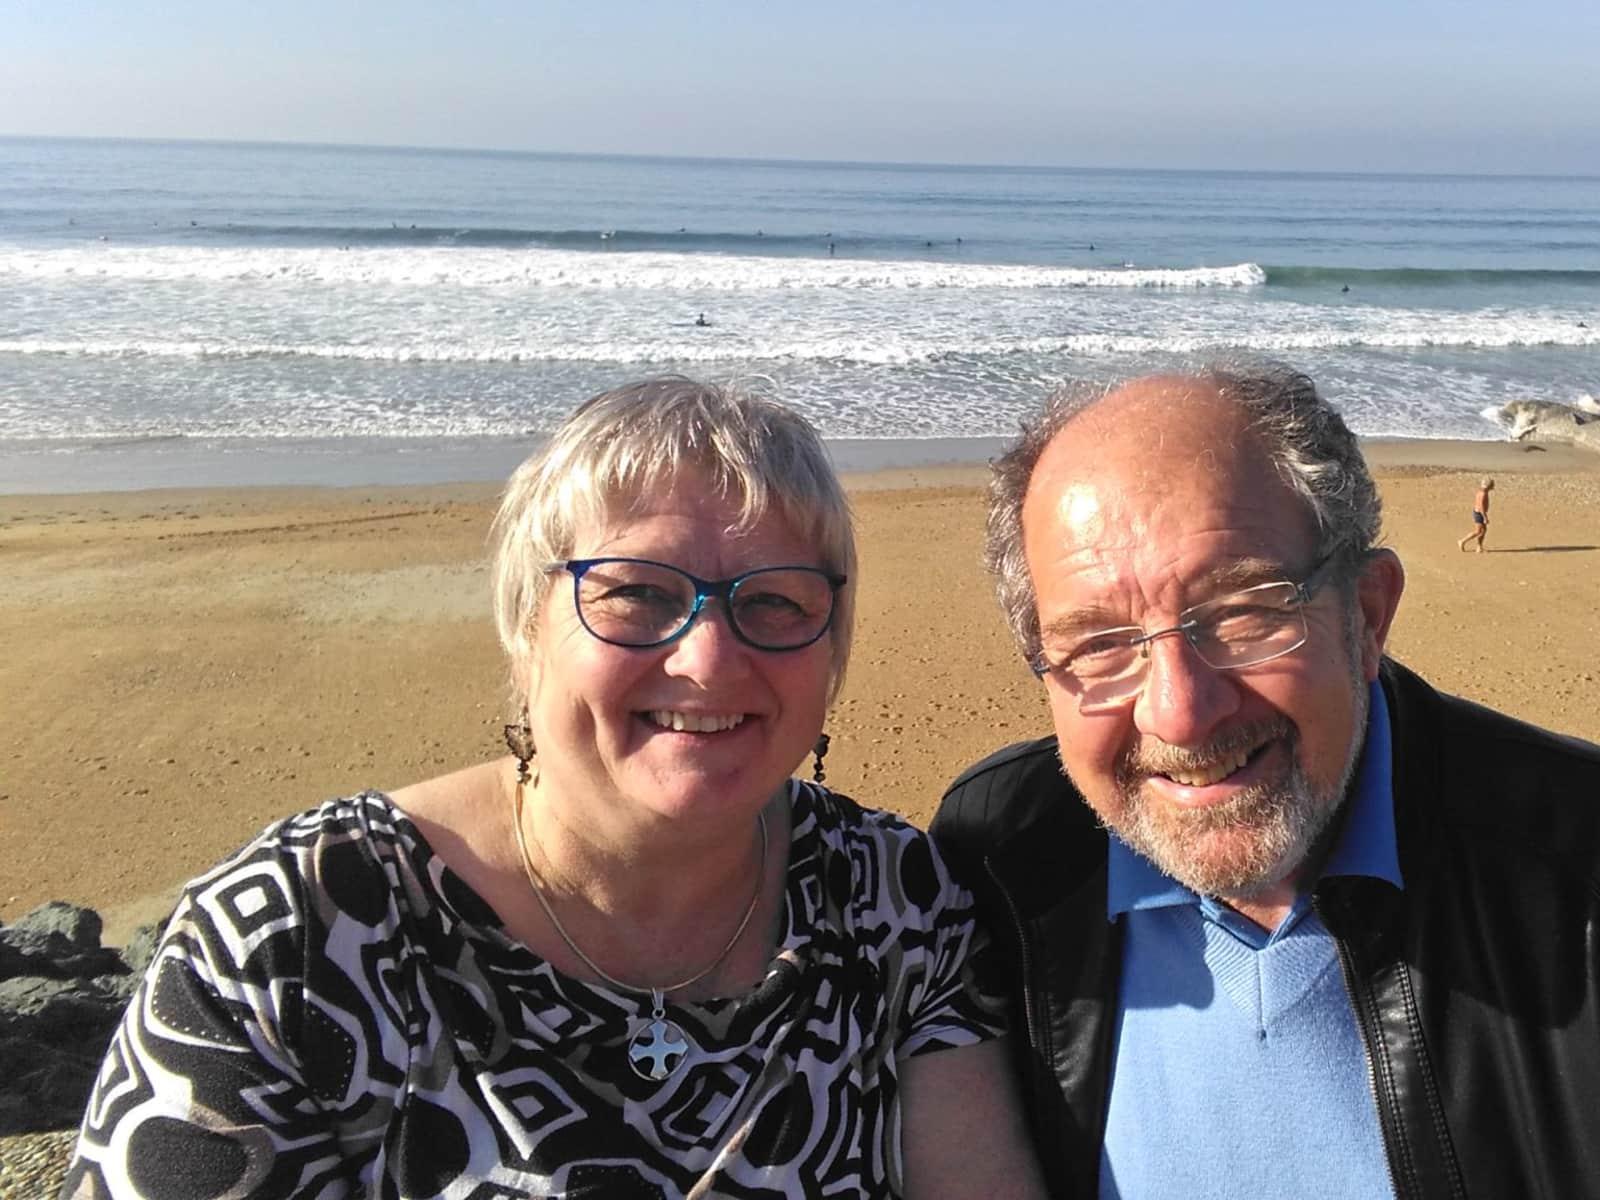 Christine & Paul from Salies-de-Béarn, France